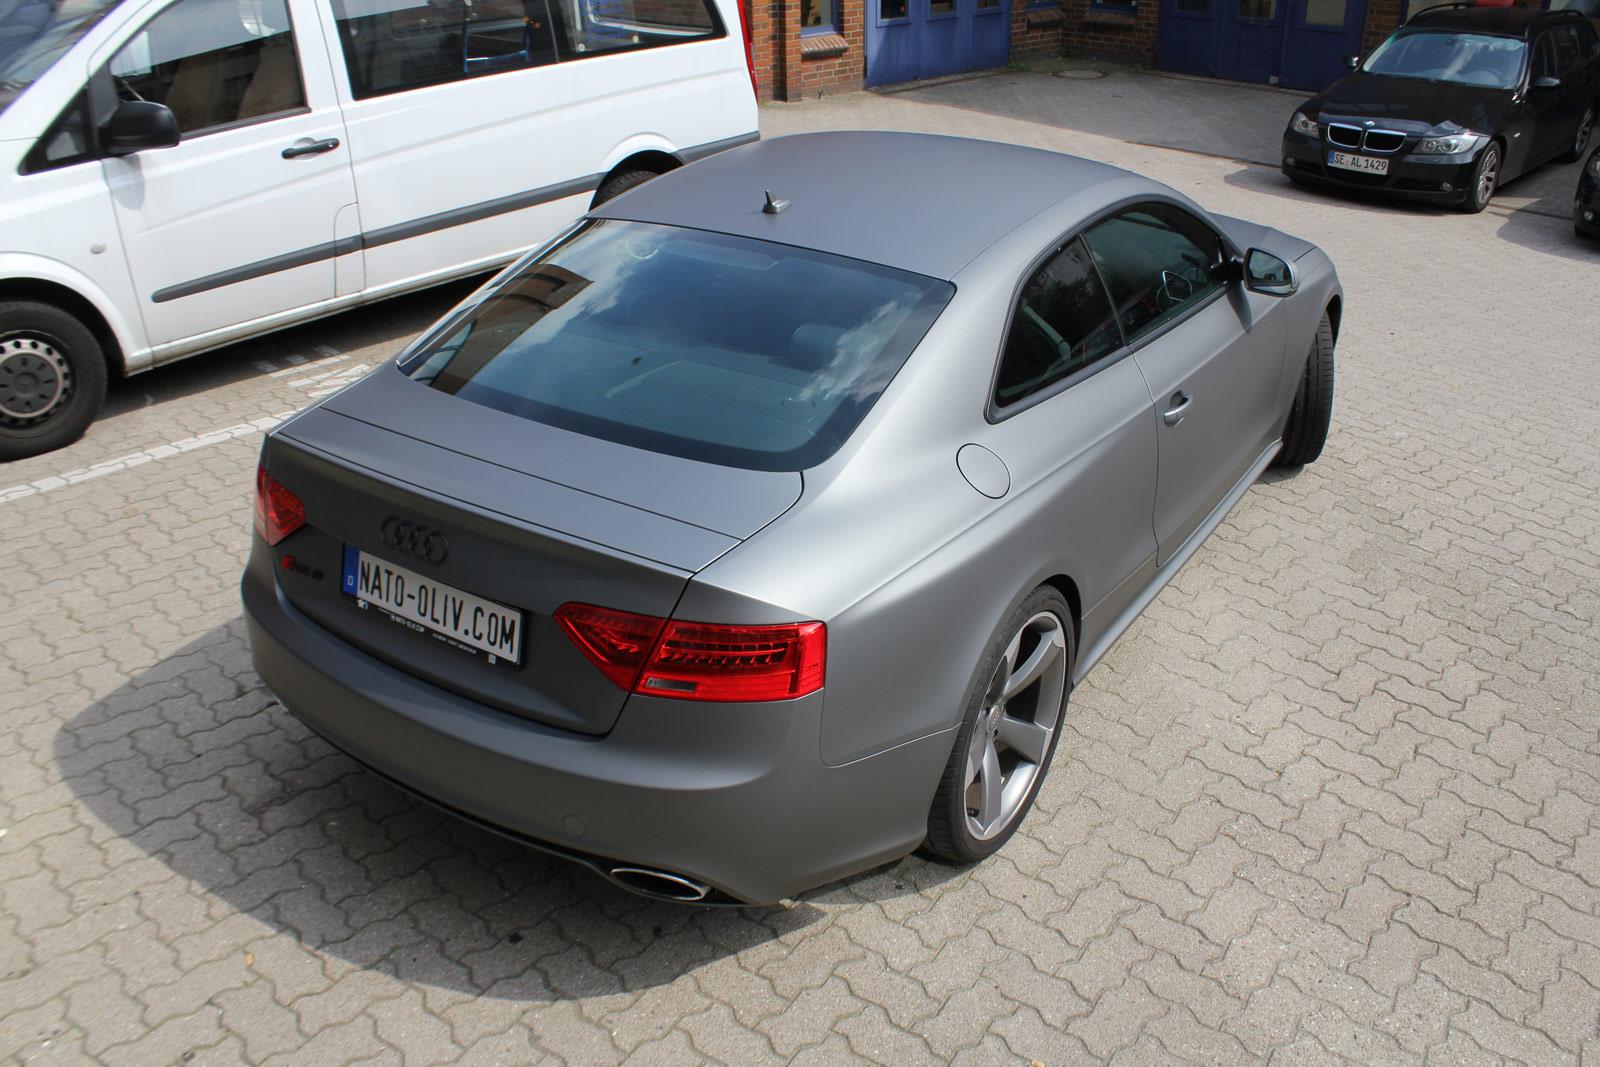 Heckansicht Audi RS5 in Gunmetal metallic matt Folie.